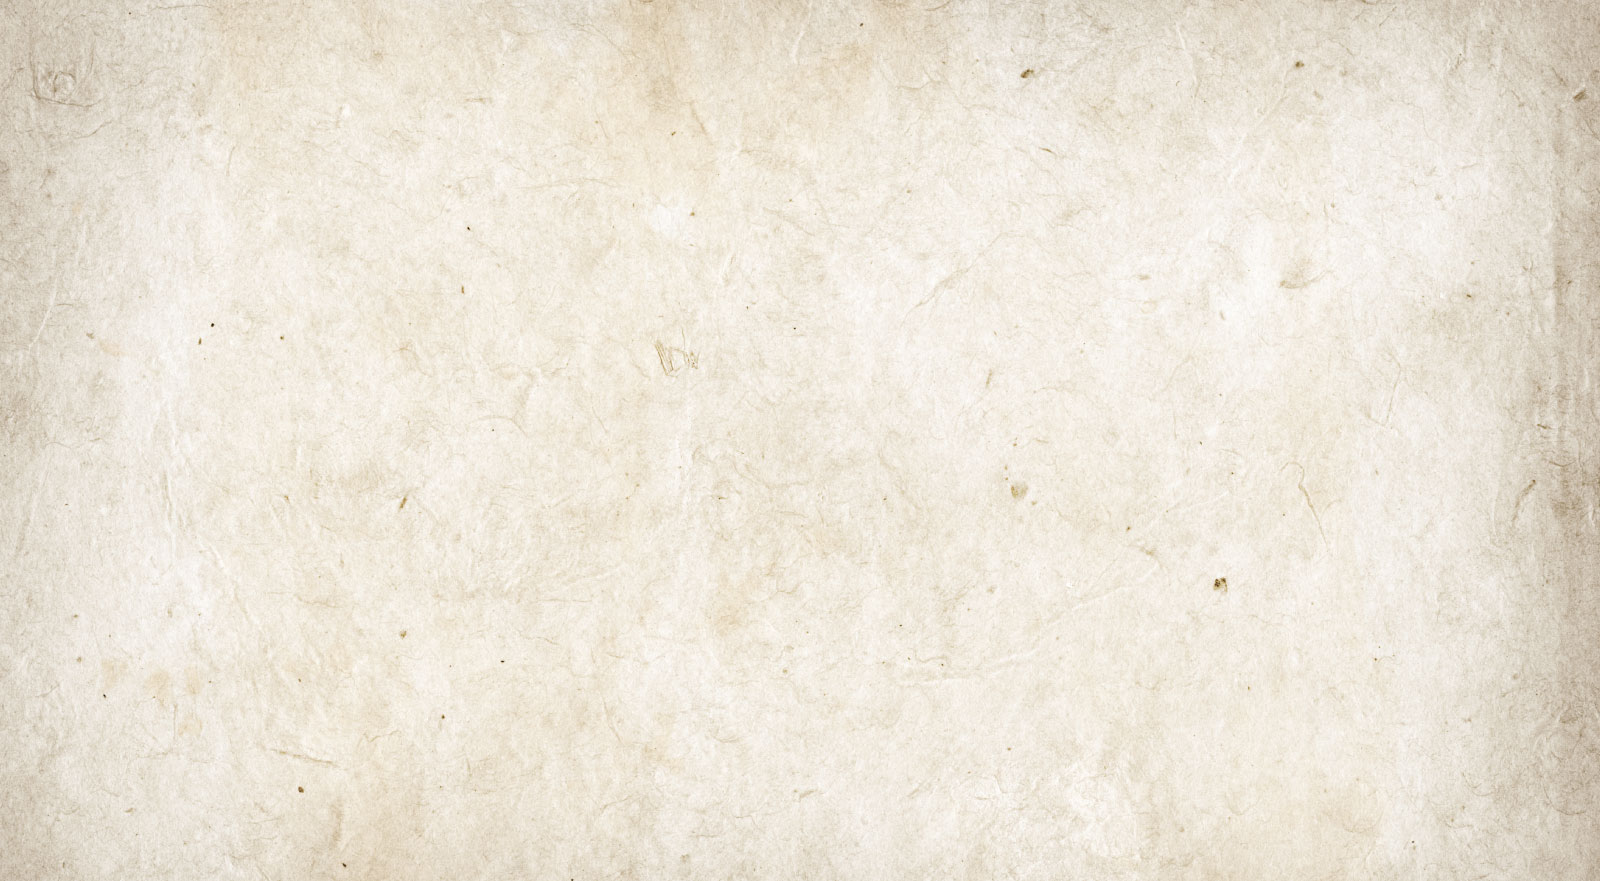 Parchment Paper Background Tierra Sur at Herzog Wine Cellars 1600x881